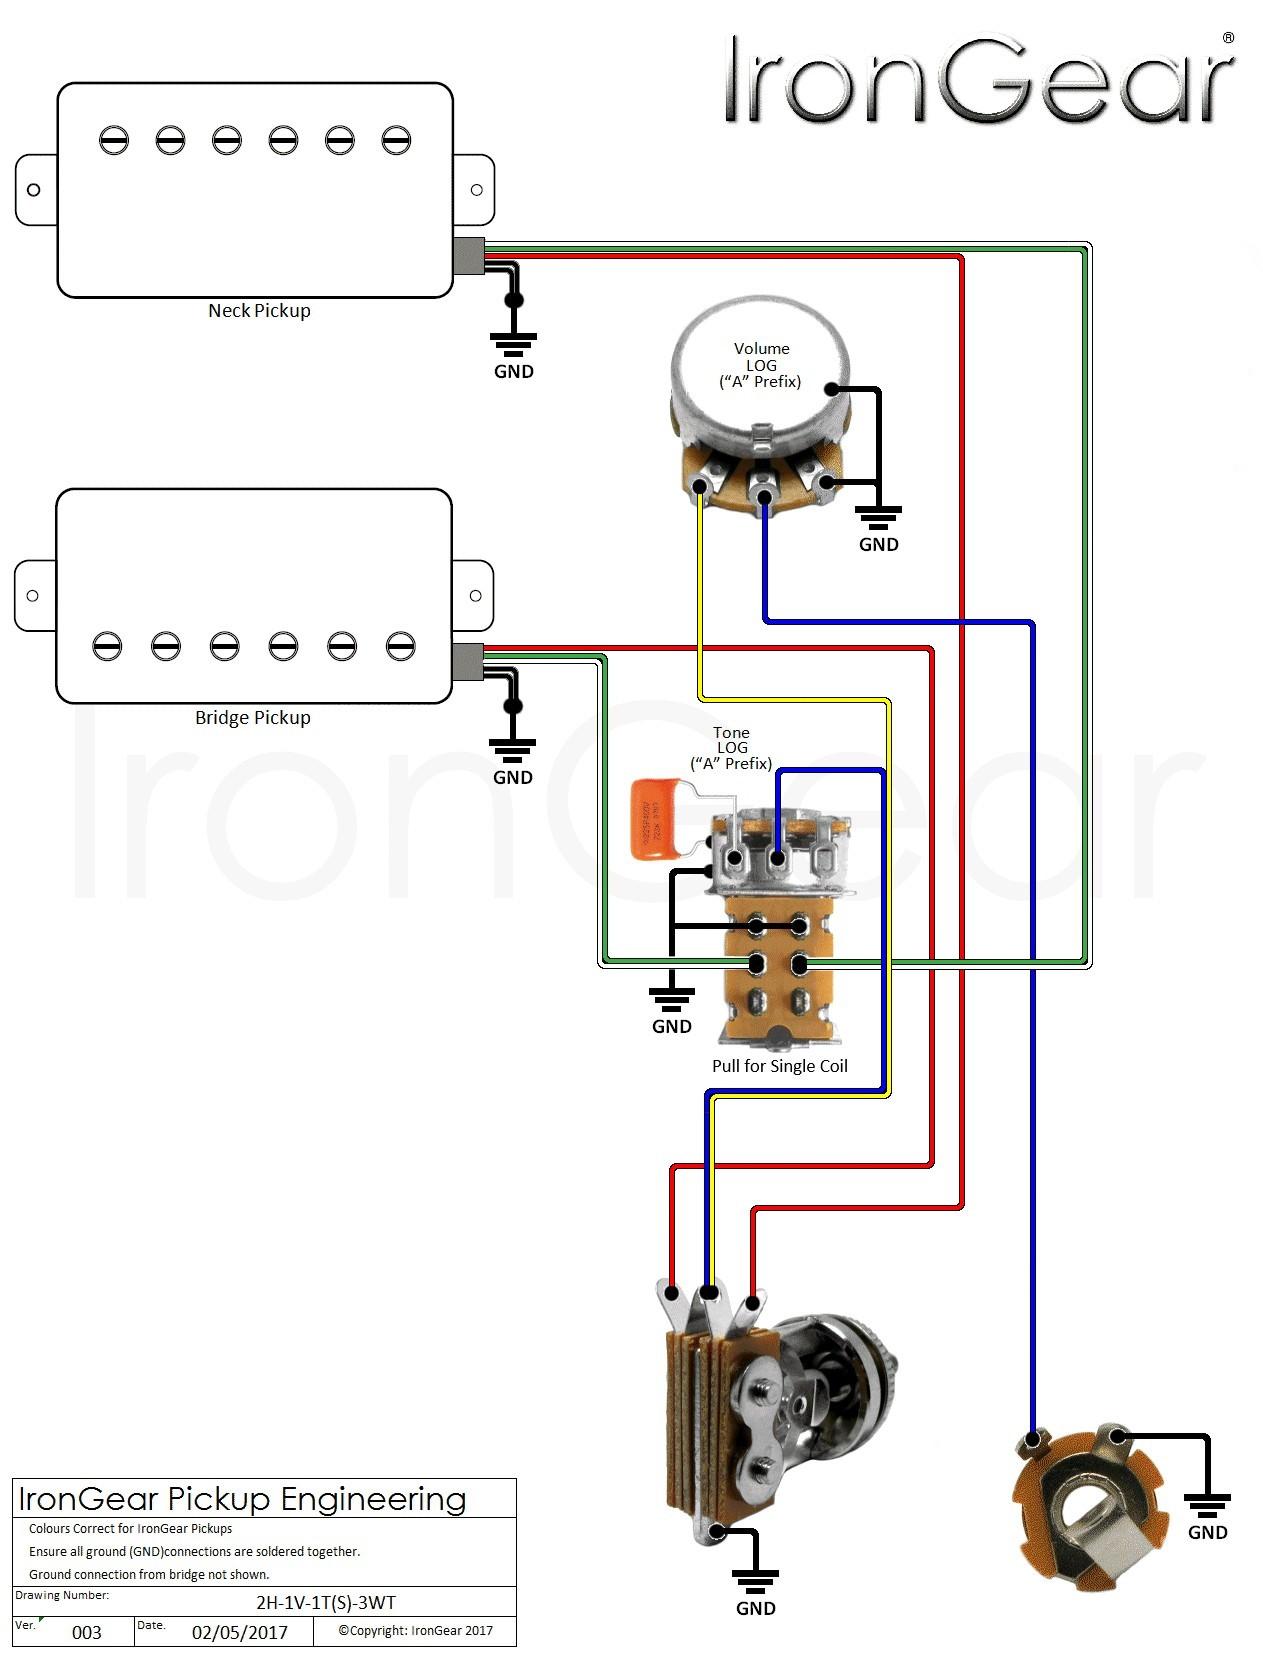 Guitar Wiring Diagram 2 Humbucker 1 Volume 1 Tone deltagenerali